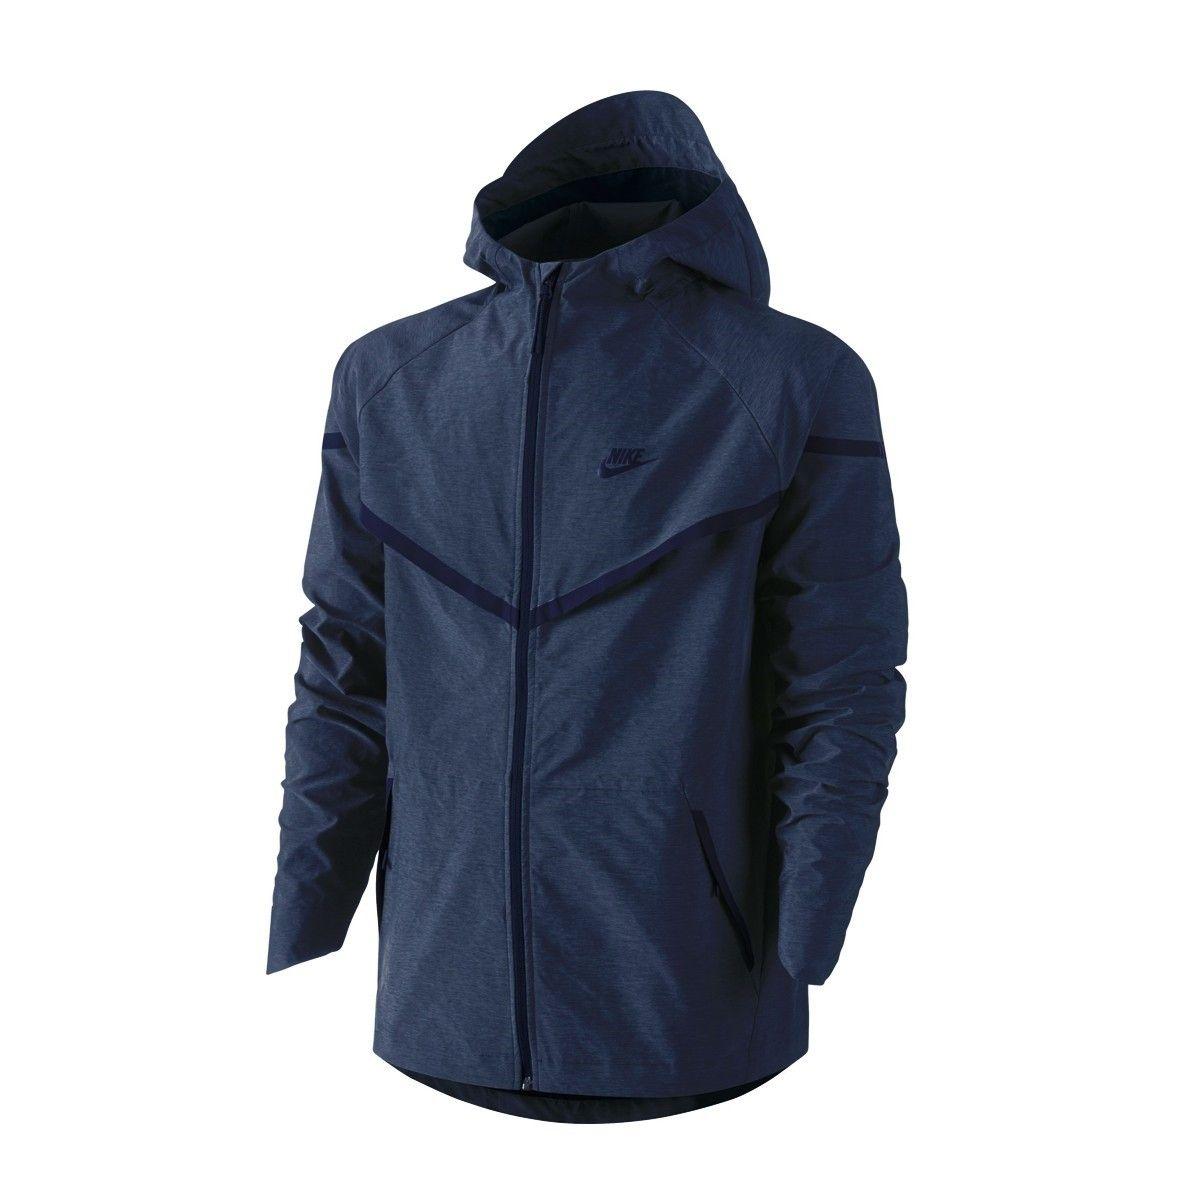 wholesale price discount shop purchase cheap Veste coupe-vent Nike Tech Fleece Windrunner - 727349-065 - Pegashoes